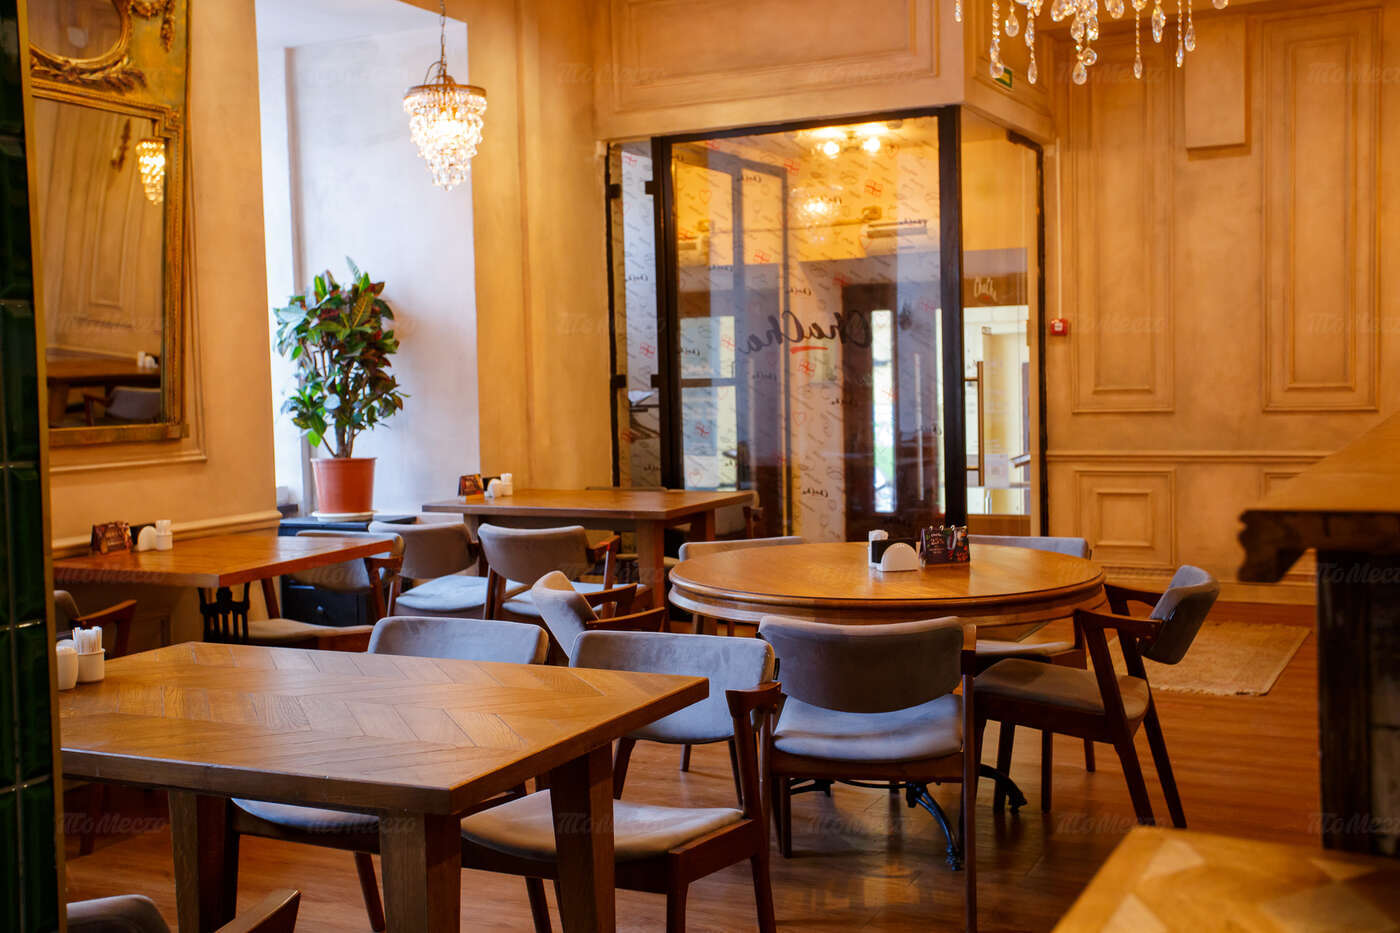 Ресторан Чача на набережной канала Грибоедова фото 18